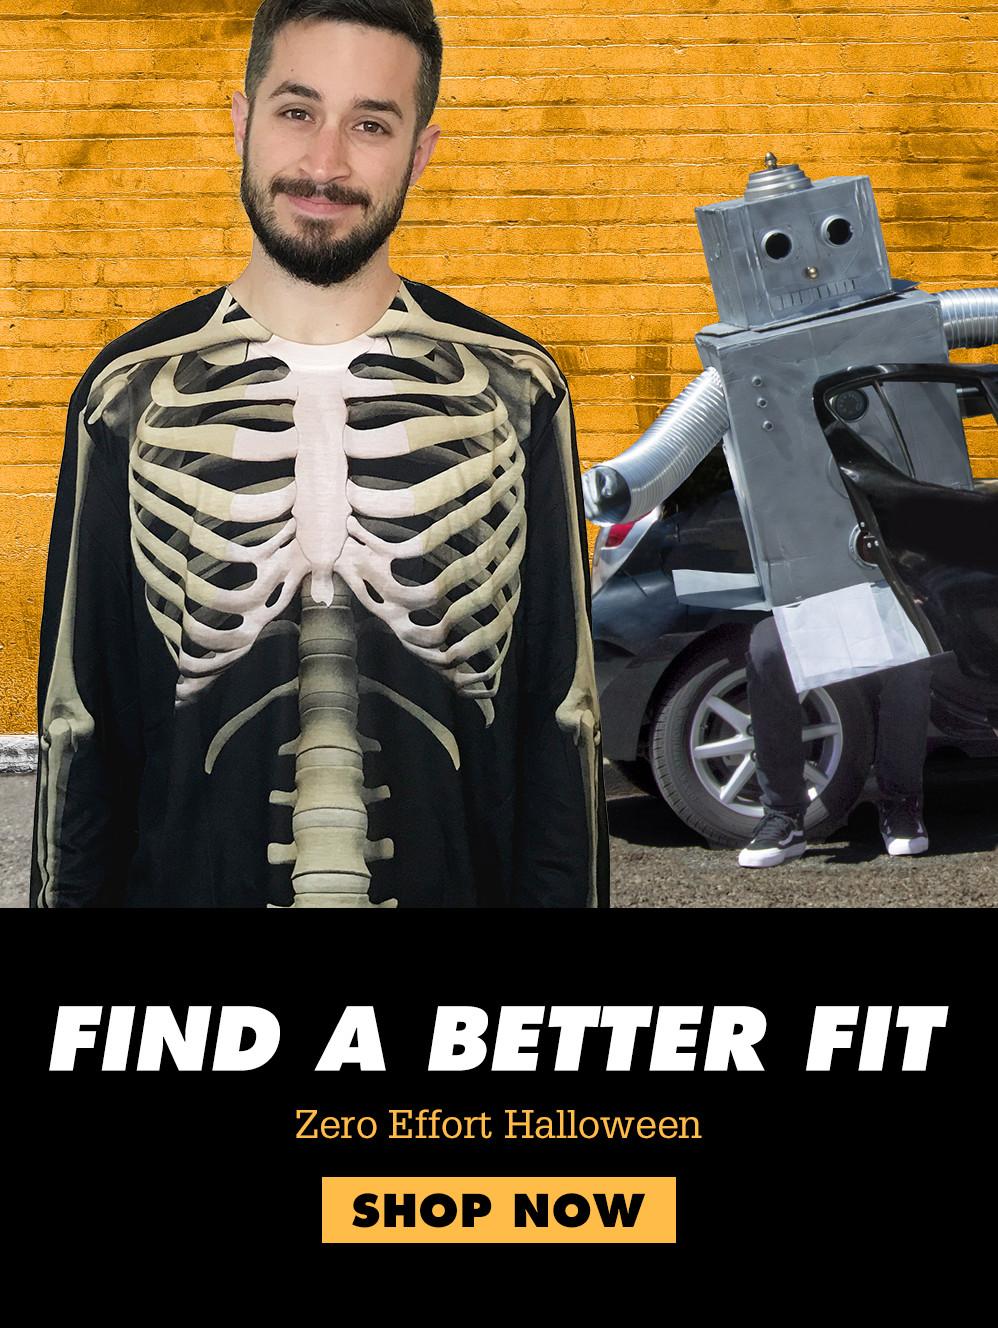 Find a Better Fit. Zero Effort Halloween. Shop Now